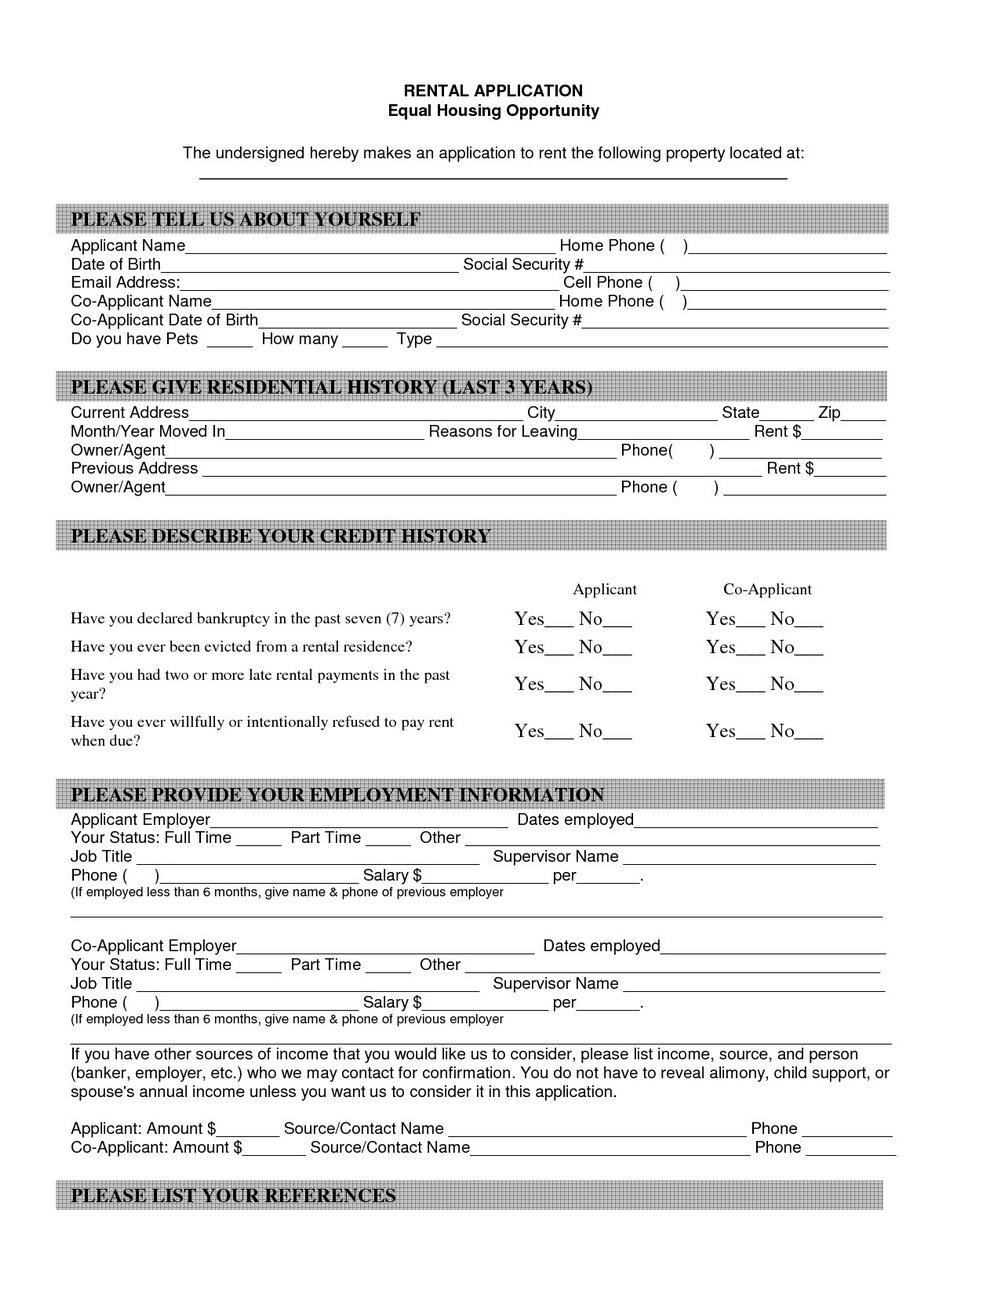 Blank Tenancy Application Form